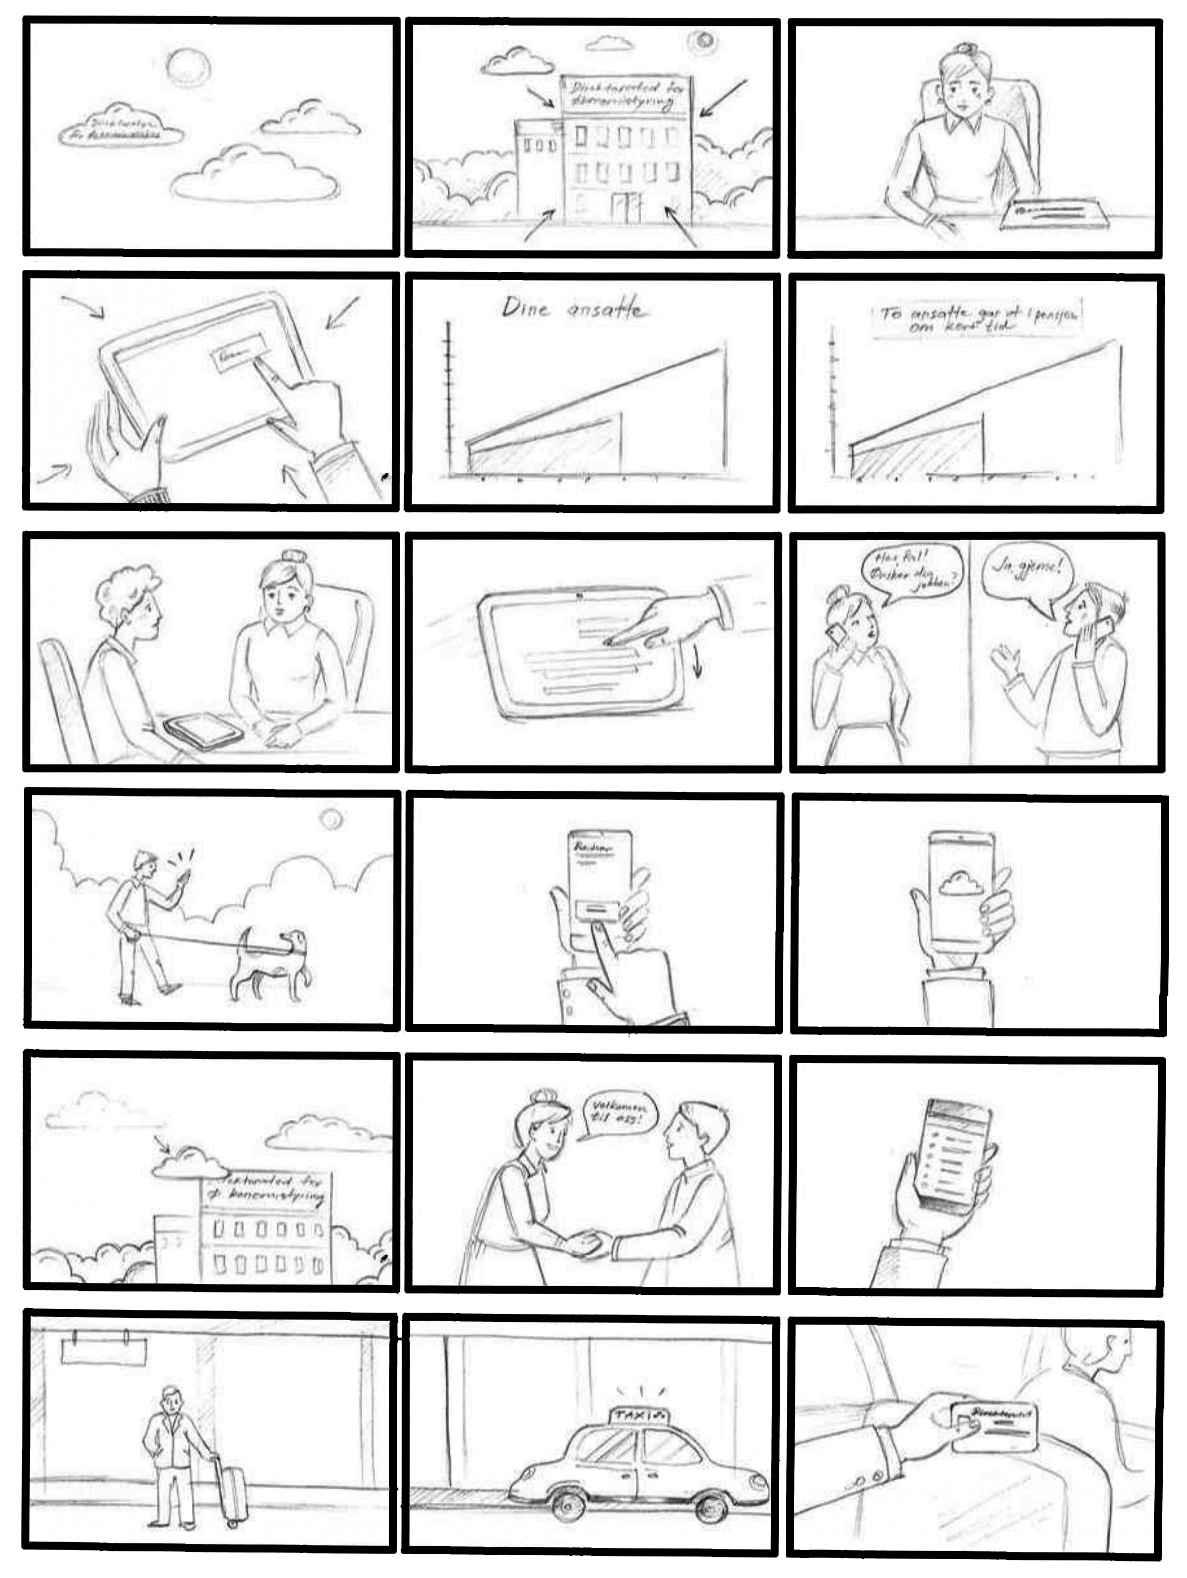 Storyboard DFO Explainer Video